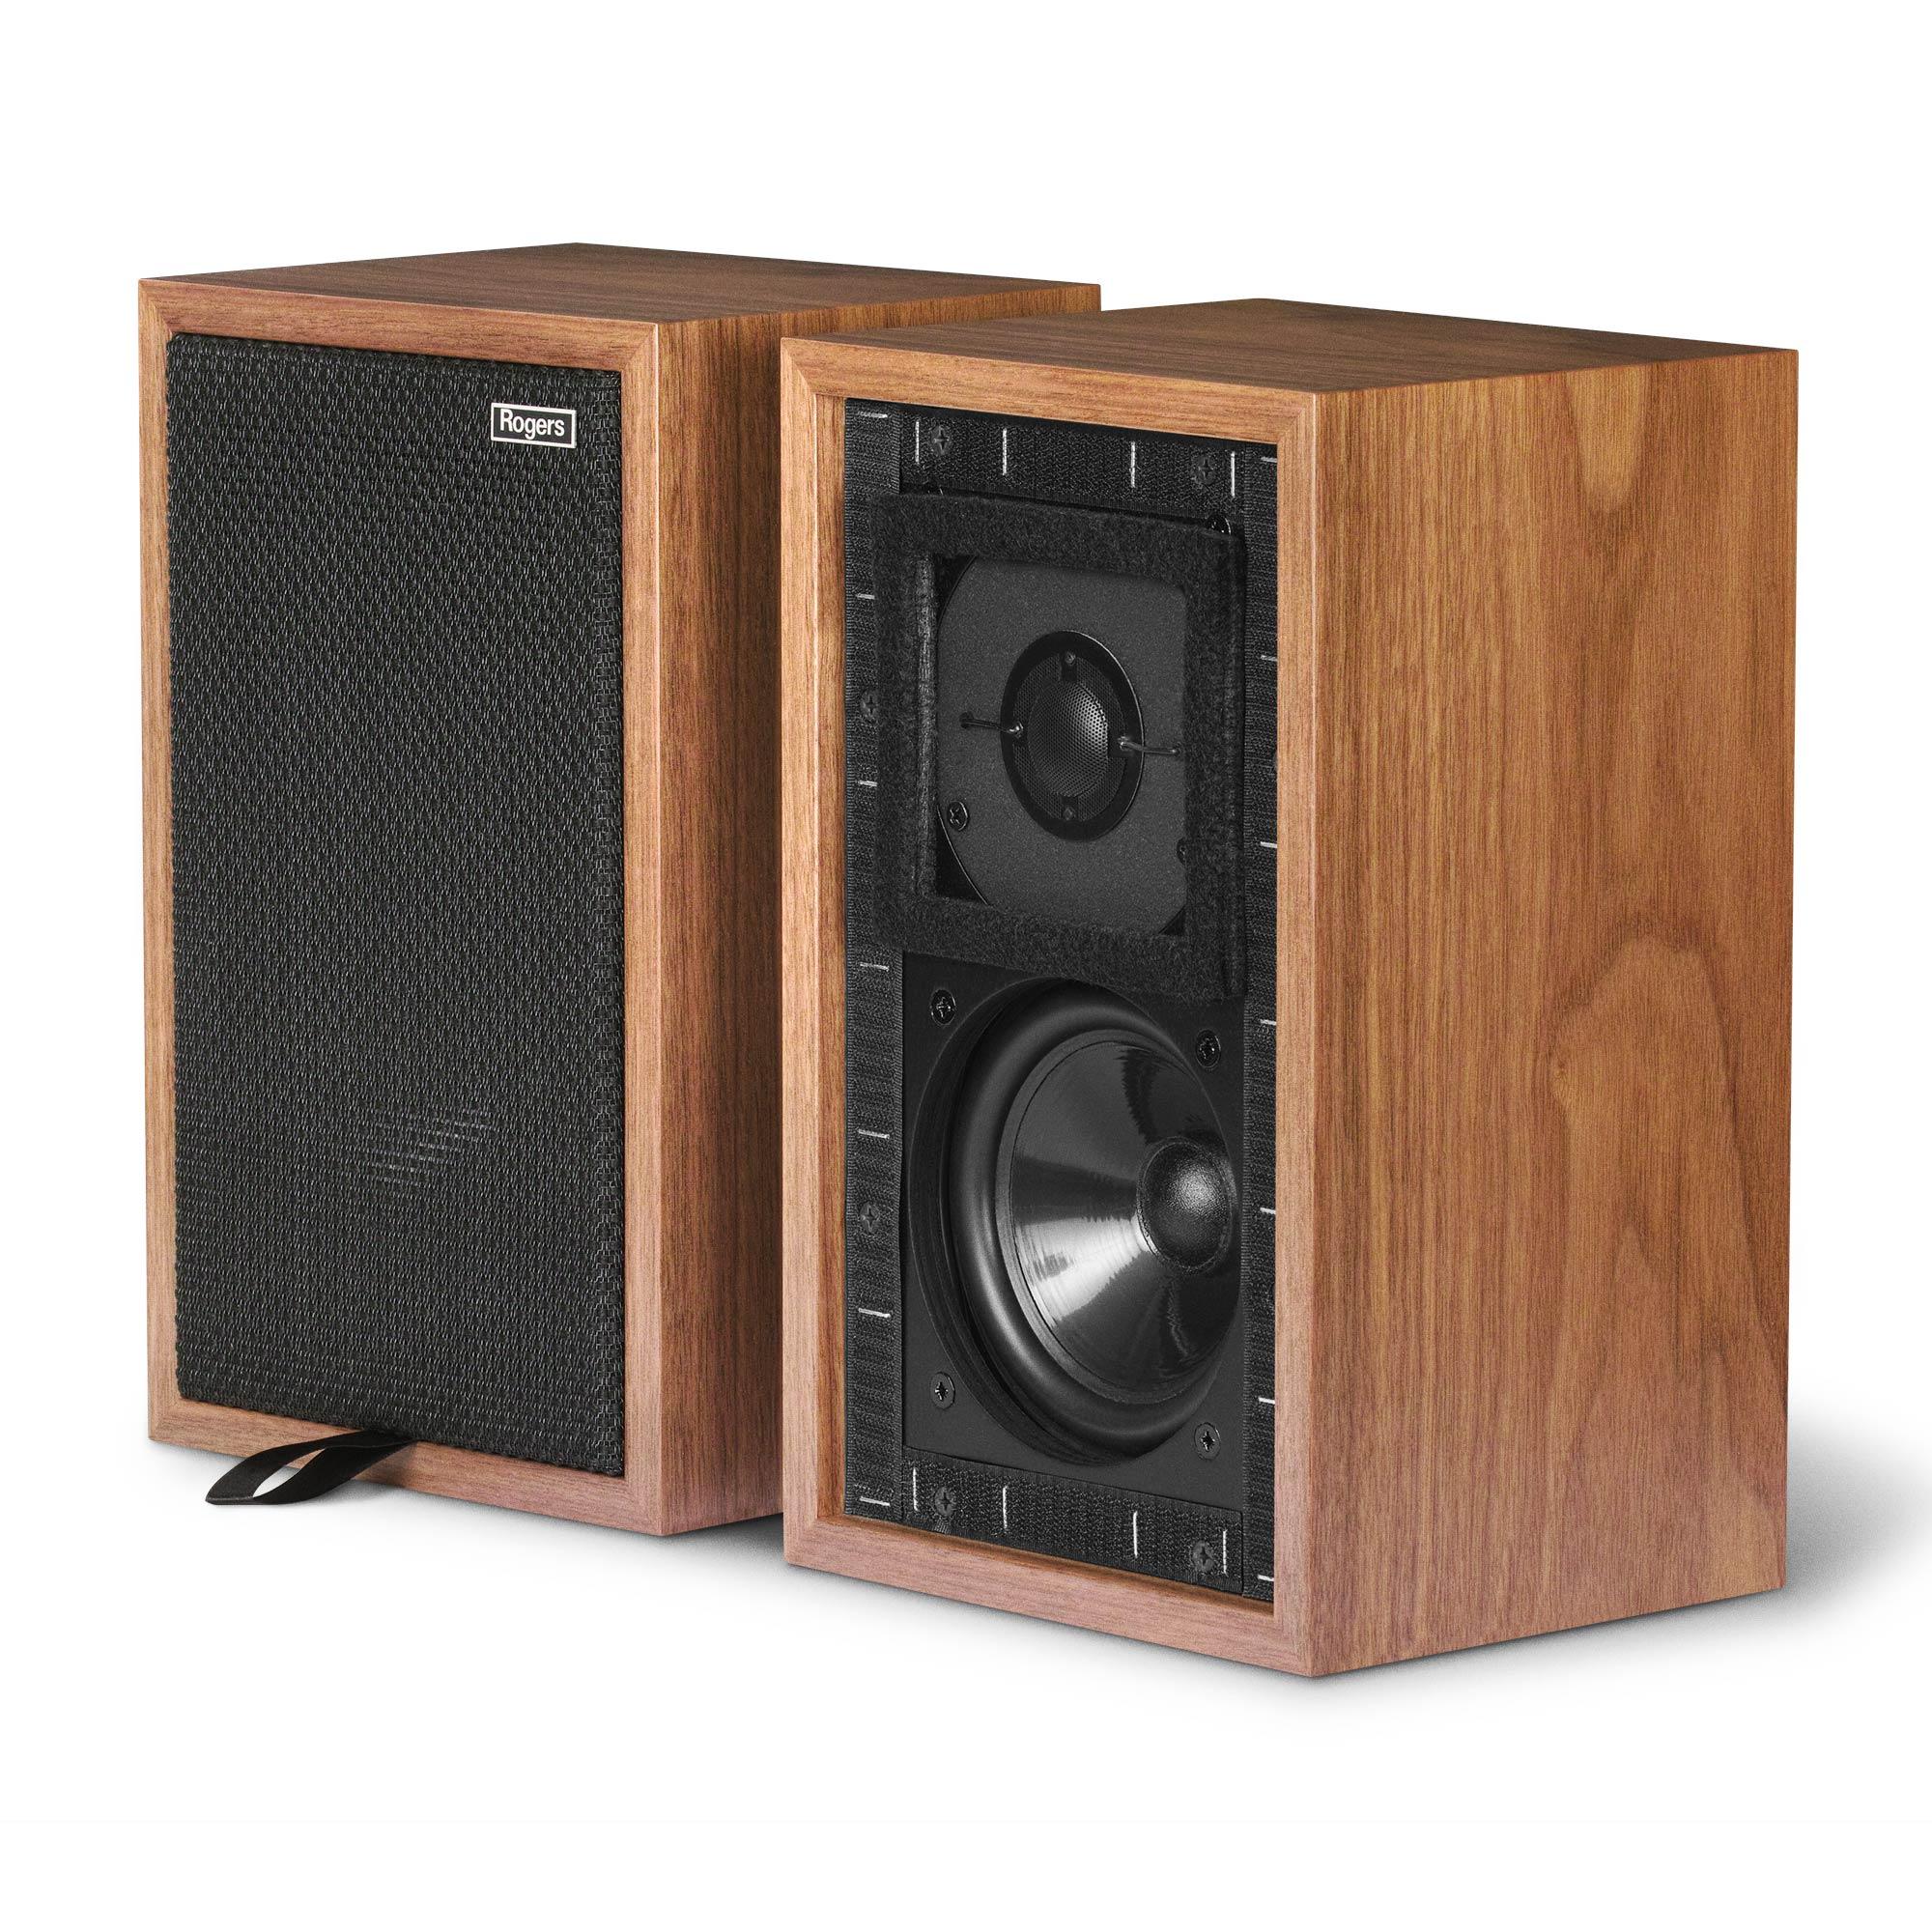 rogers-ls3-5a-speaker-2.jpg